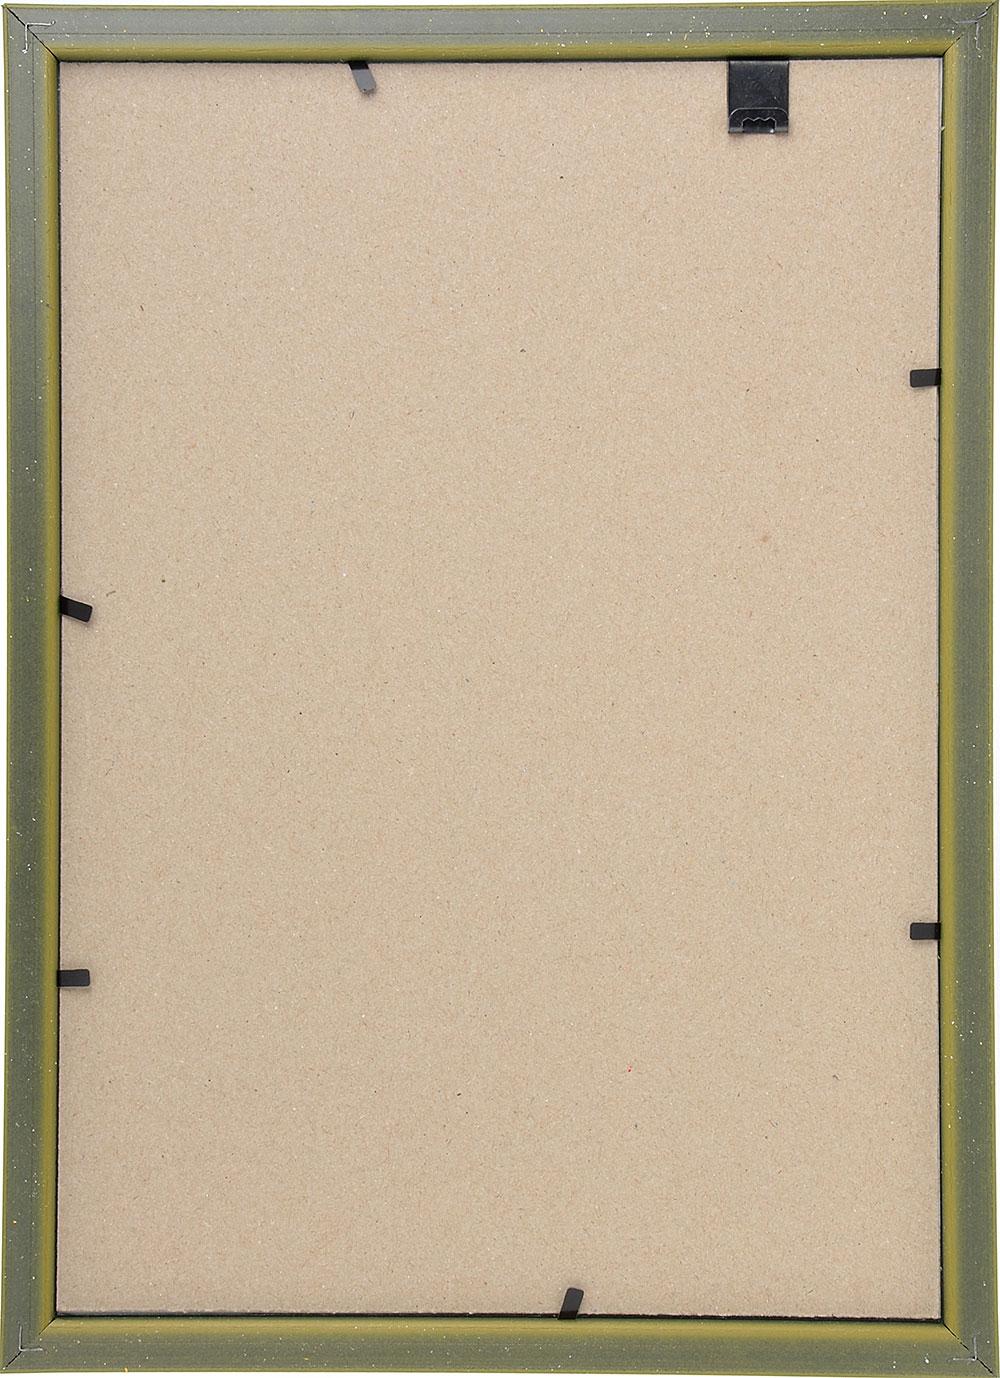 Фоторамка 21х30, пластик, стекло, 5 цветов (бронза, орех, бук, серебро, золото)